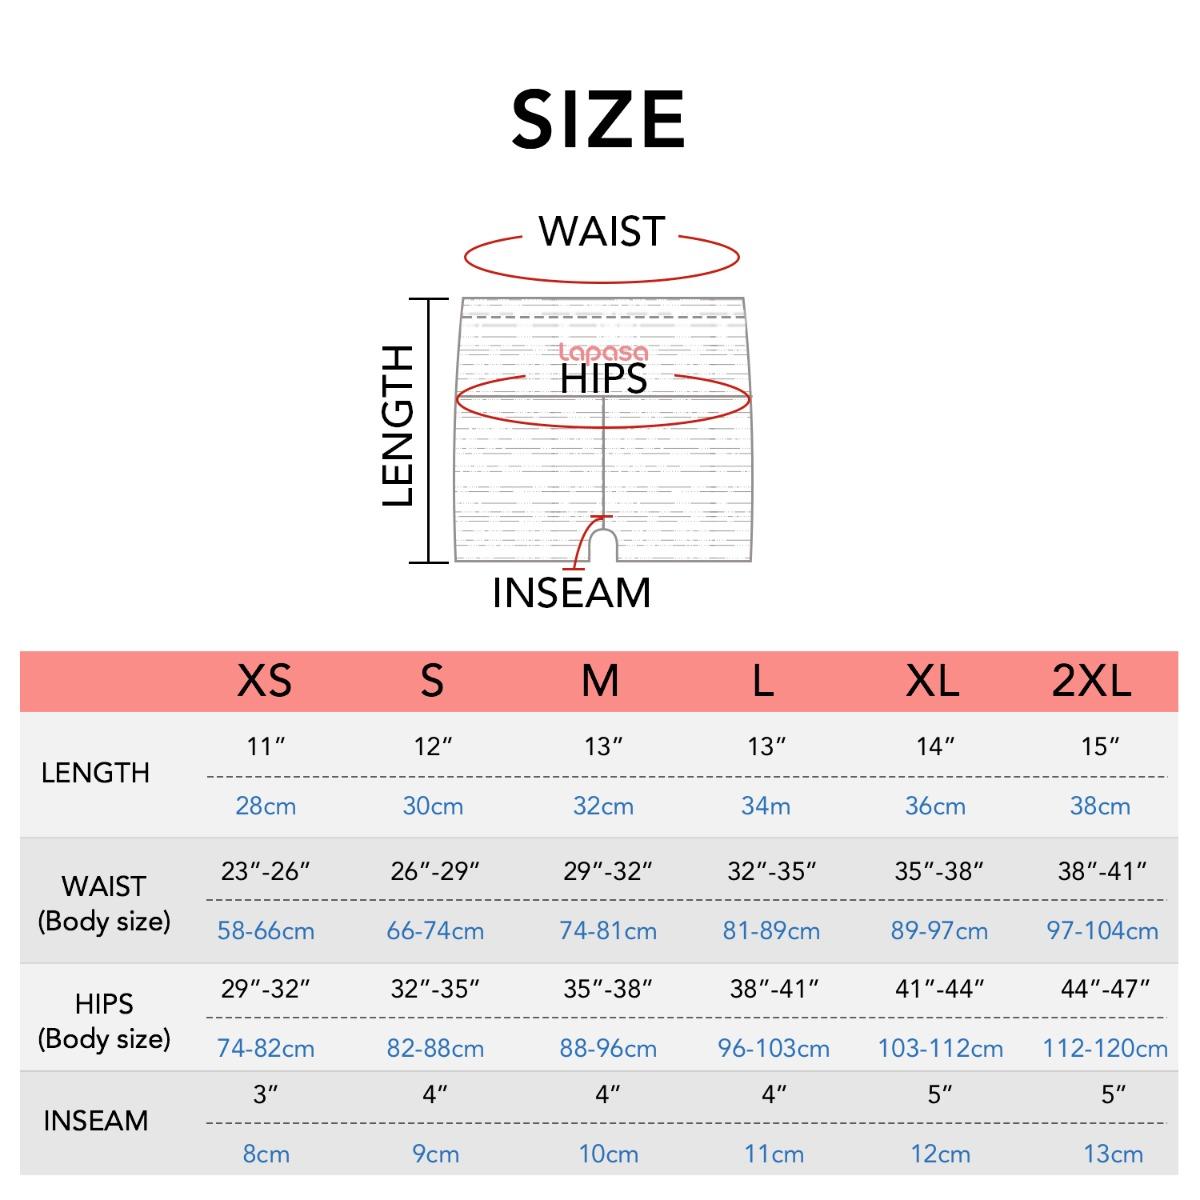 L09 size chart